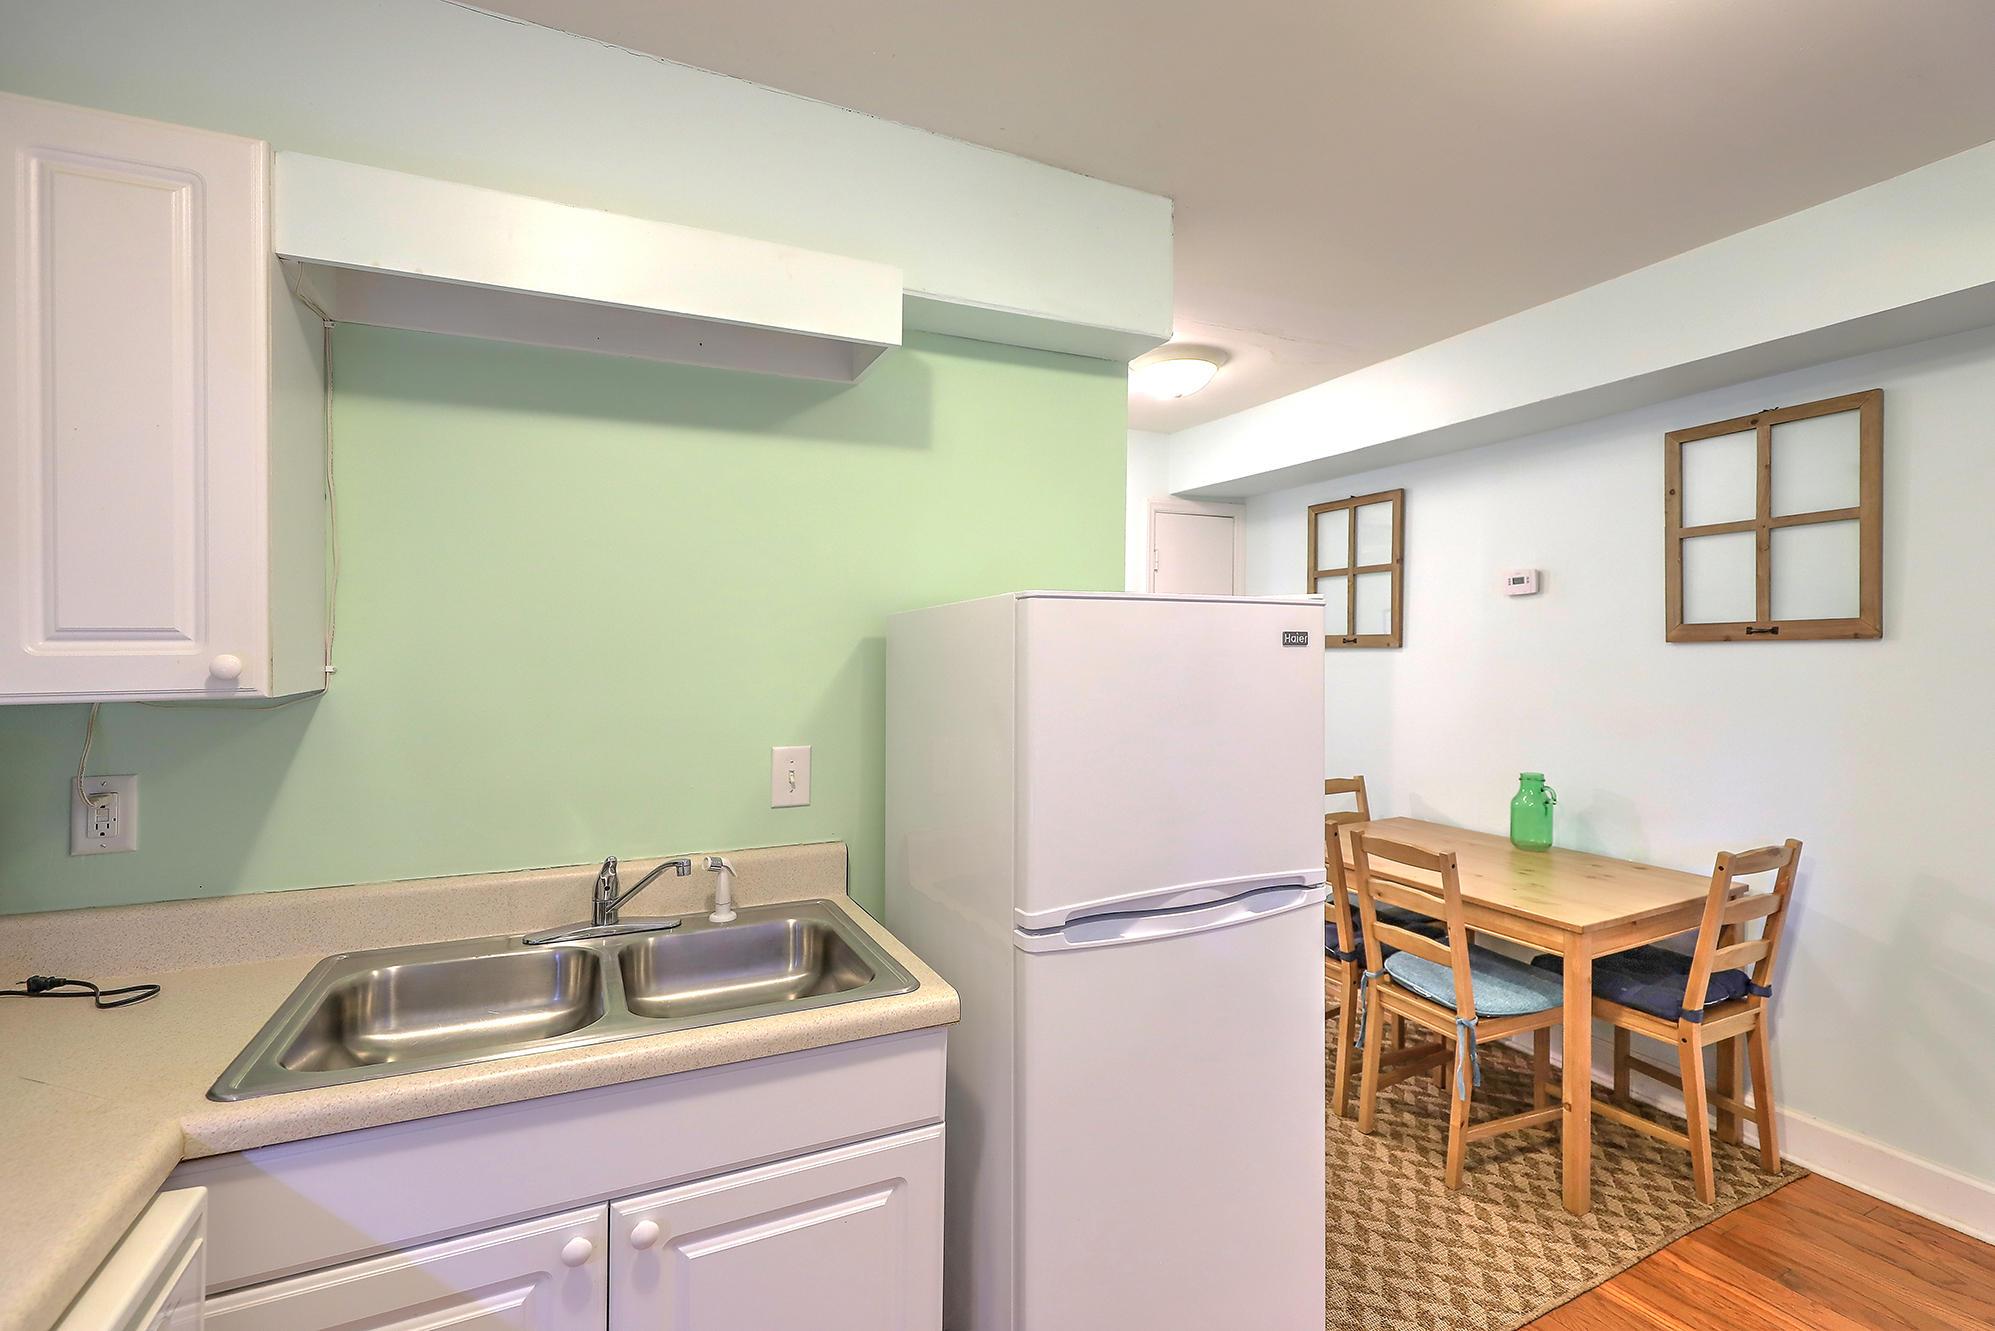 Marsh Grass Condominiums Homes For Sale - 1501 Ben Sawyer, Mount Pleasant, SC - 15